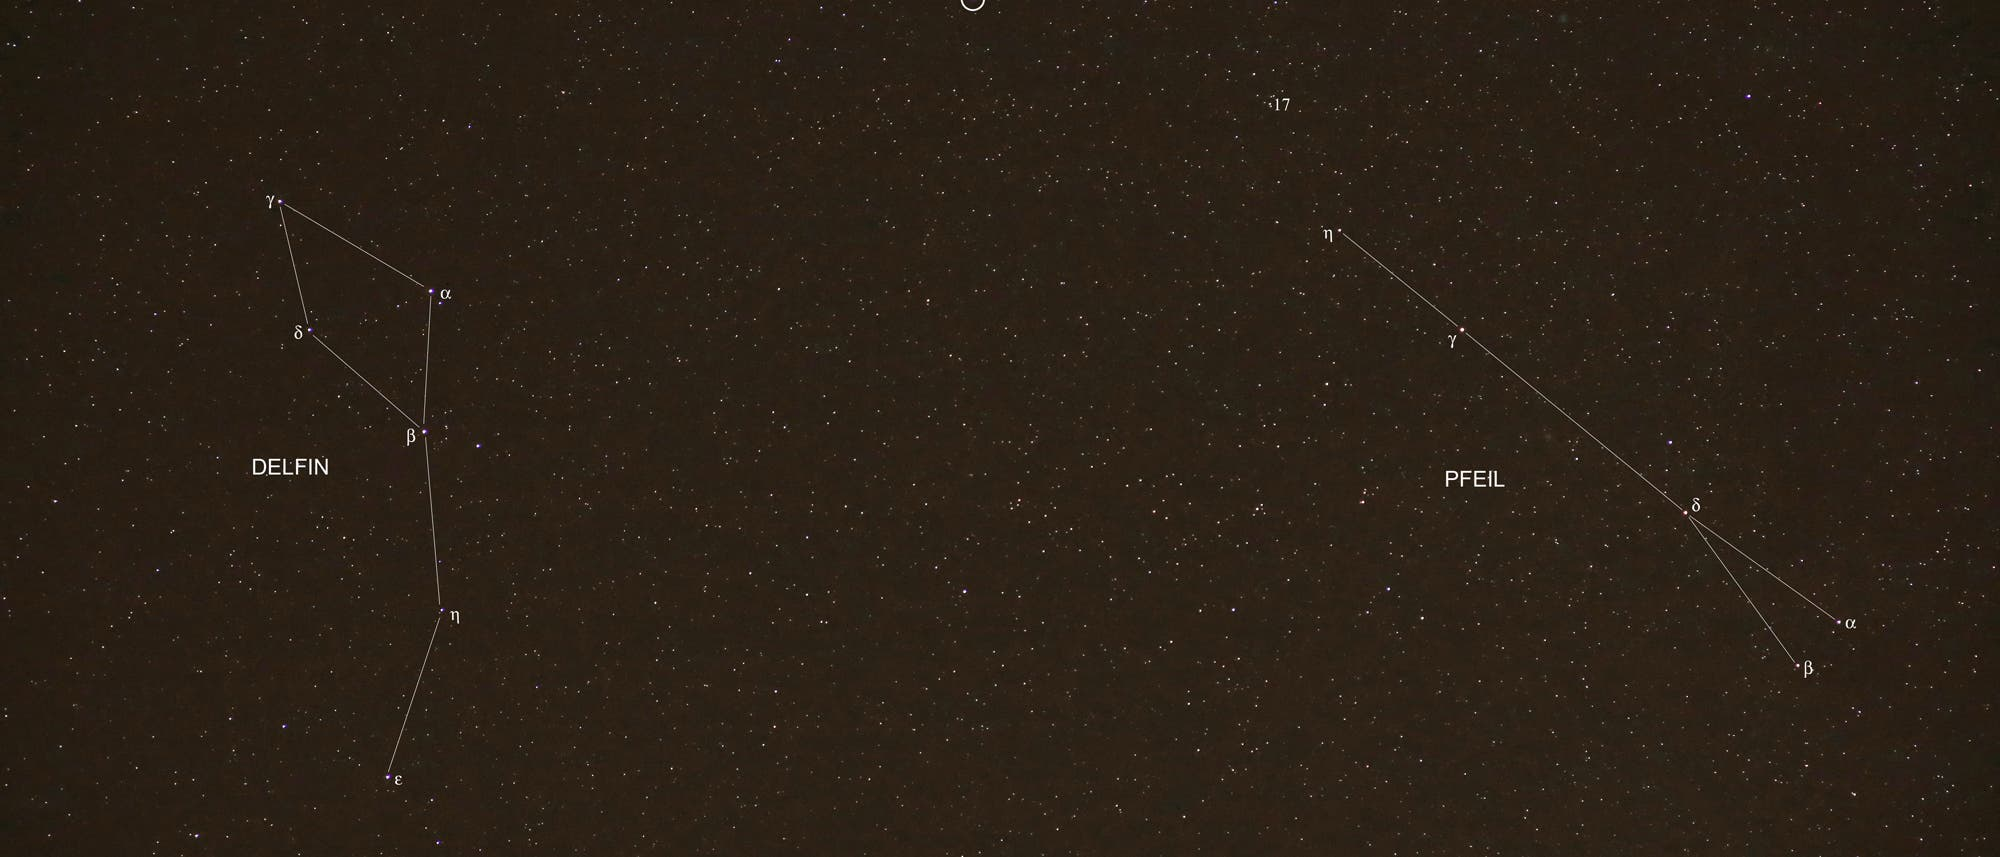 Nova Delphini 2013 Übersicht